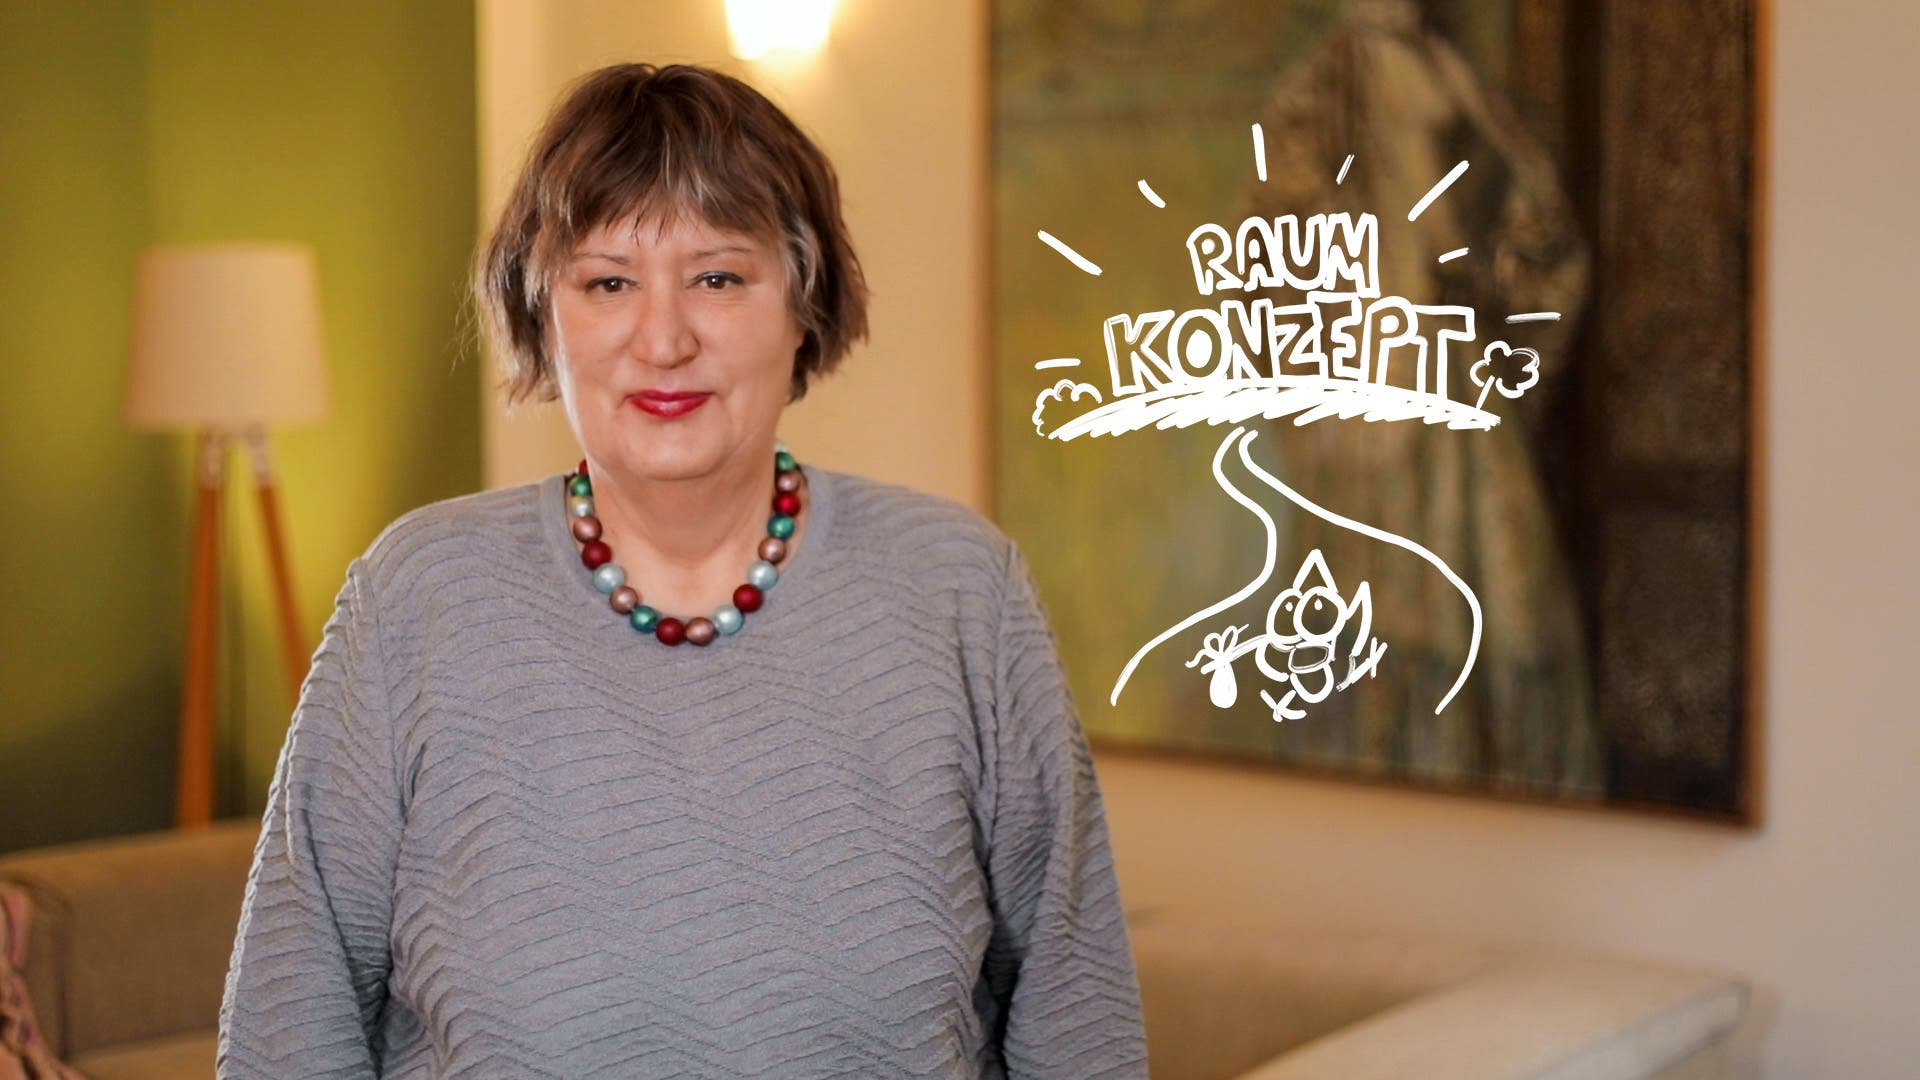 Christel van Dieken Raumkonzepte